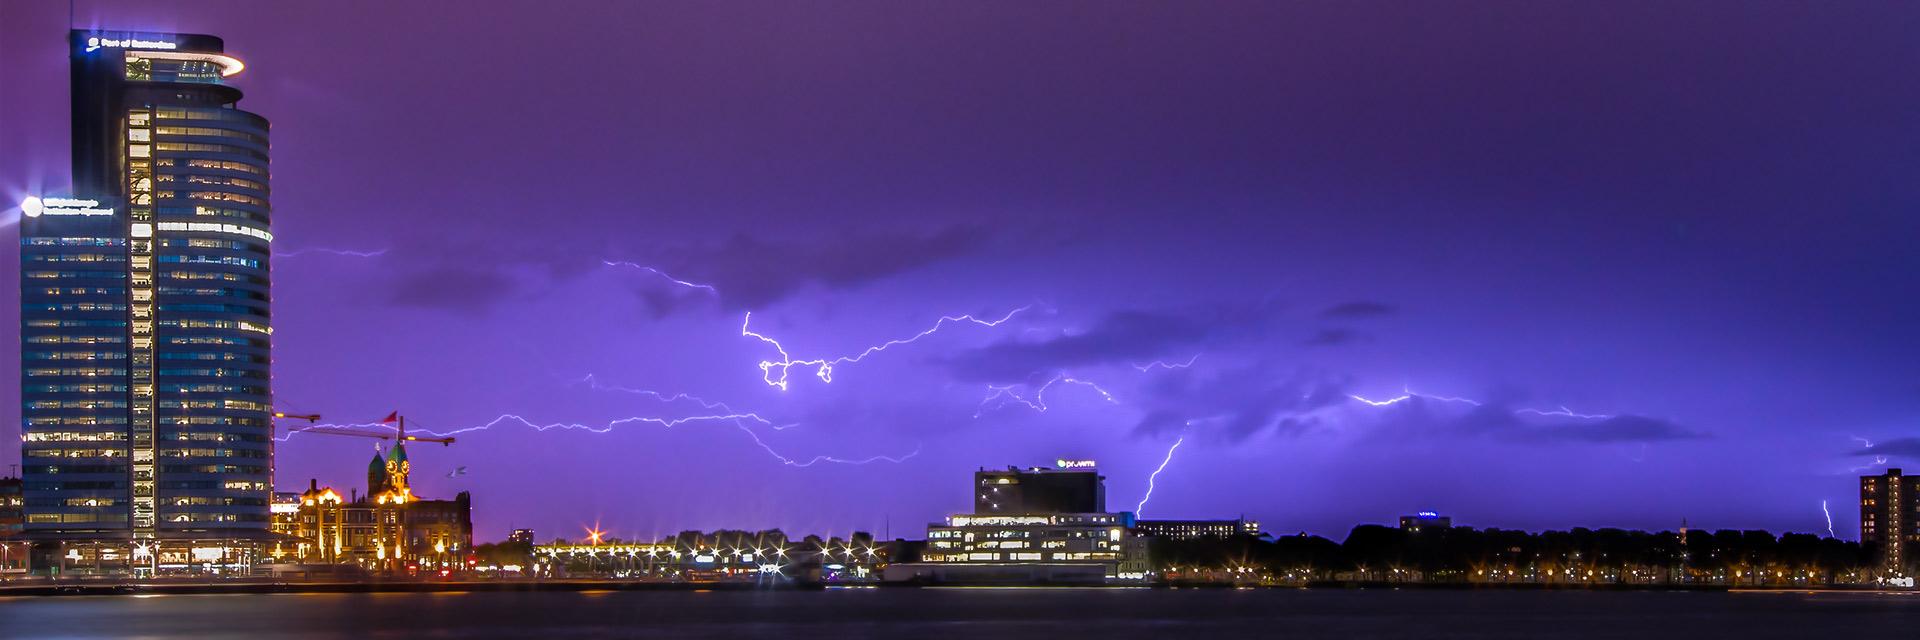 onweer, natuurgeweld, natuurfotografie